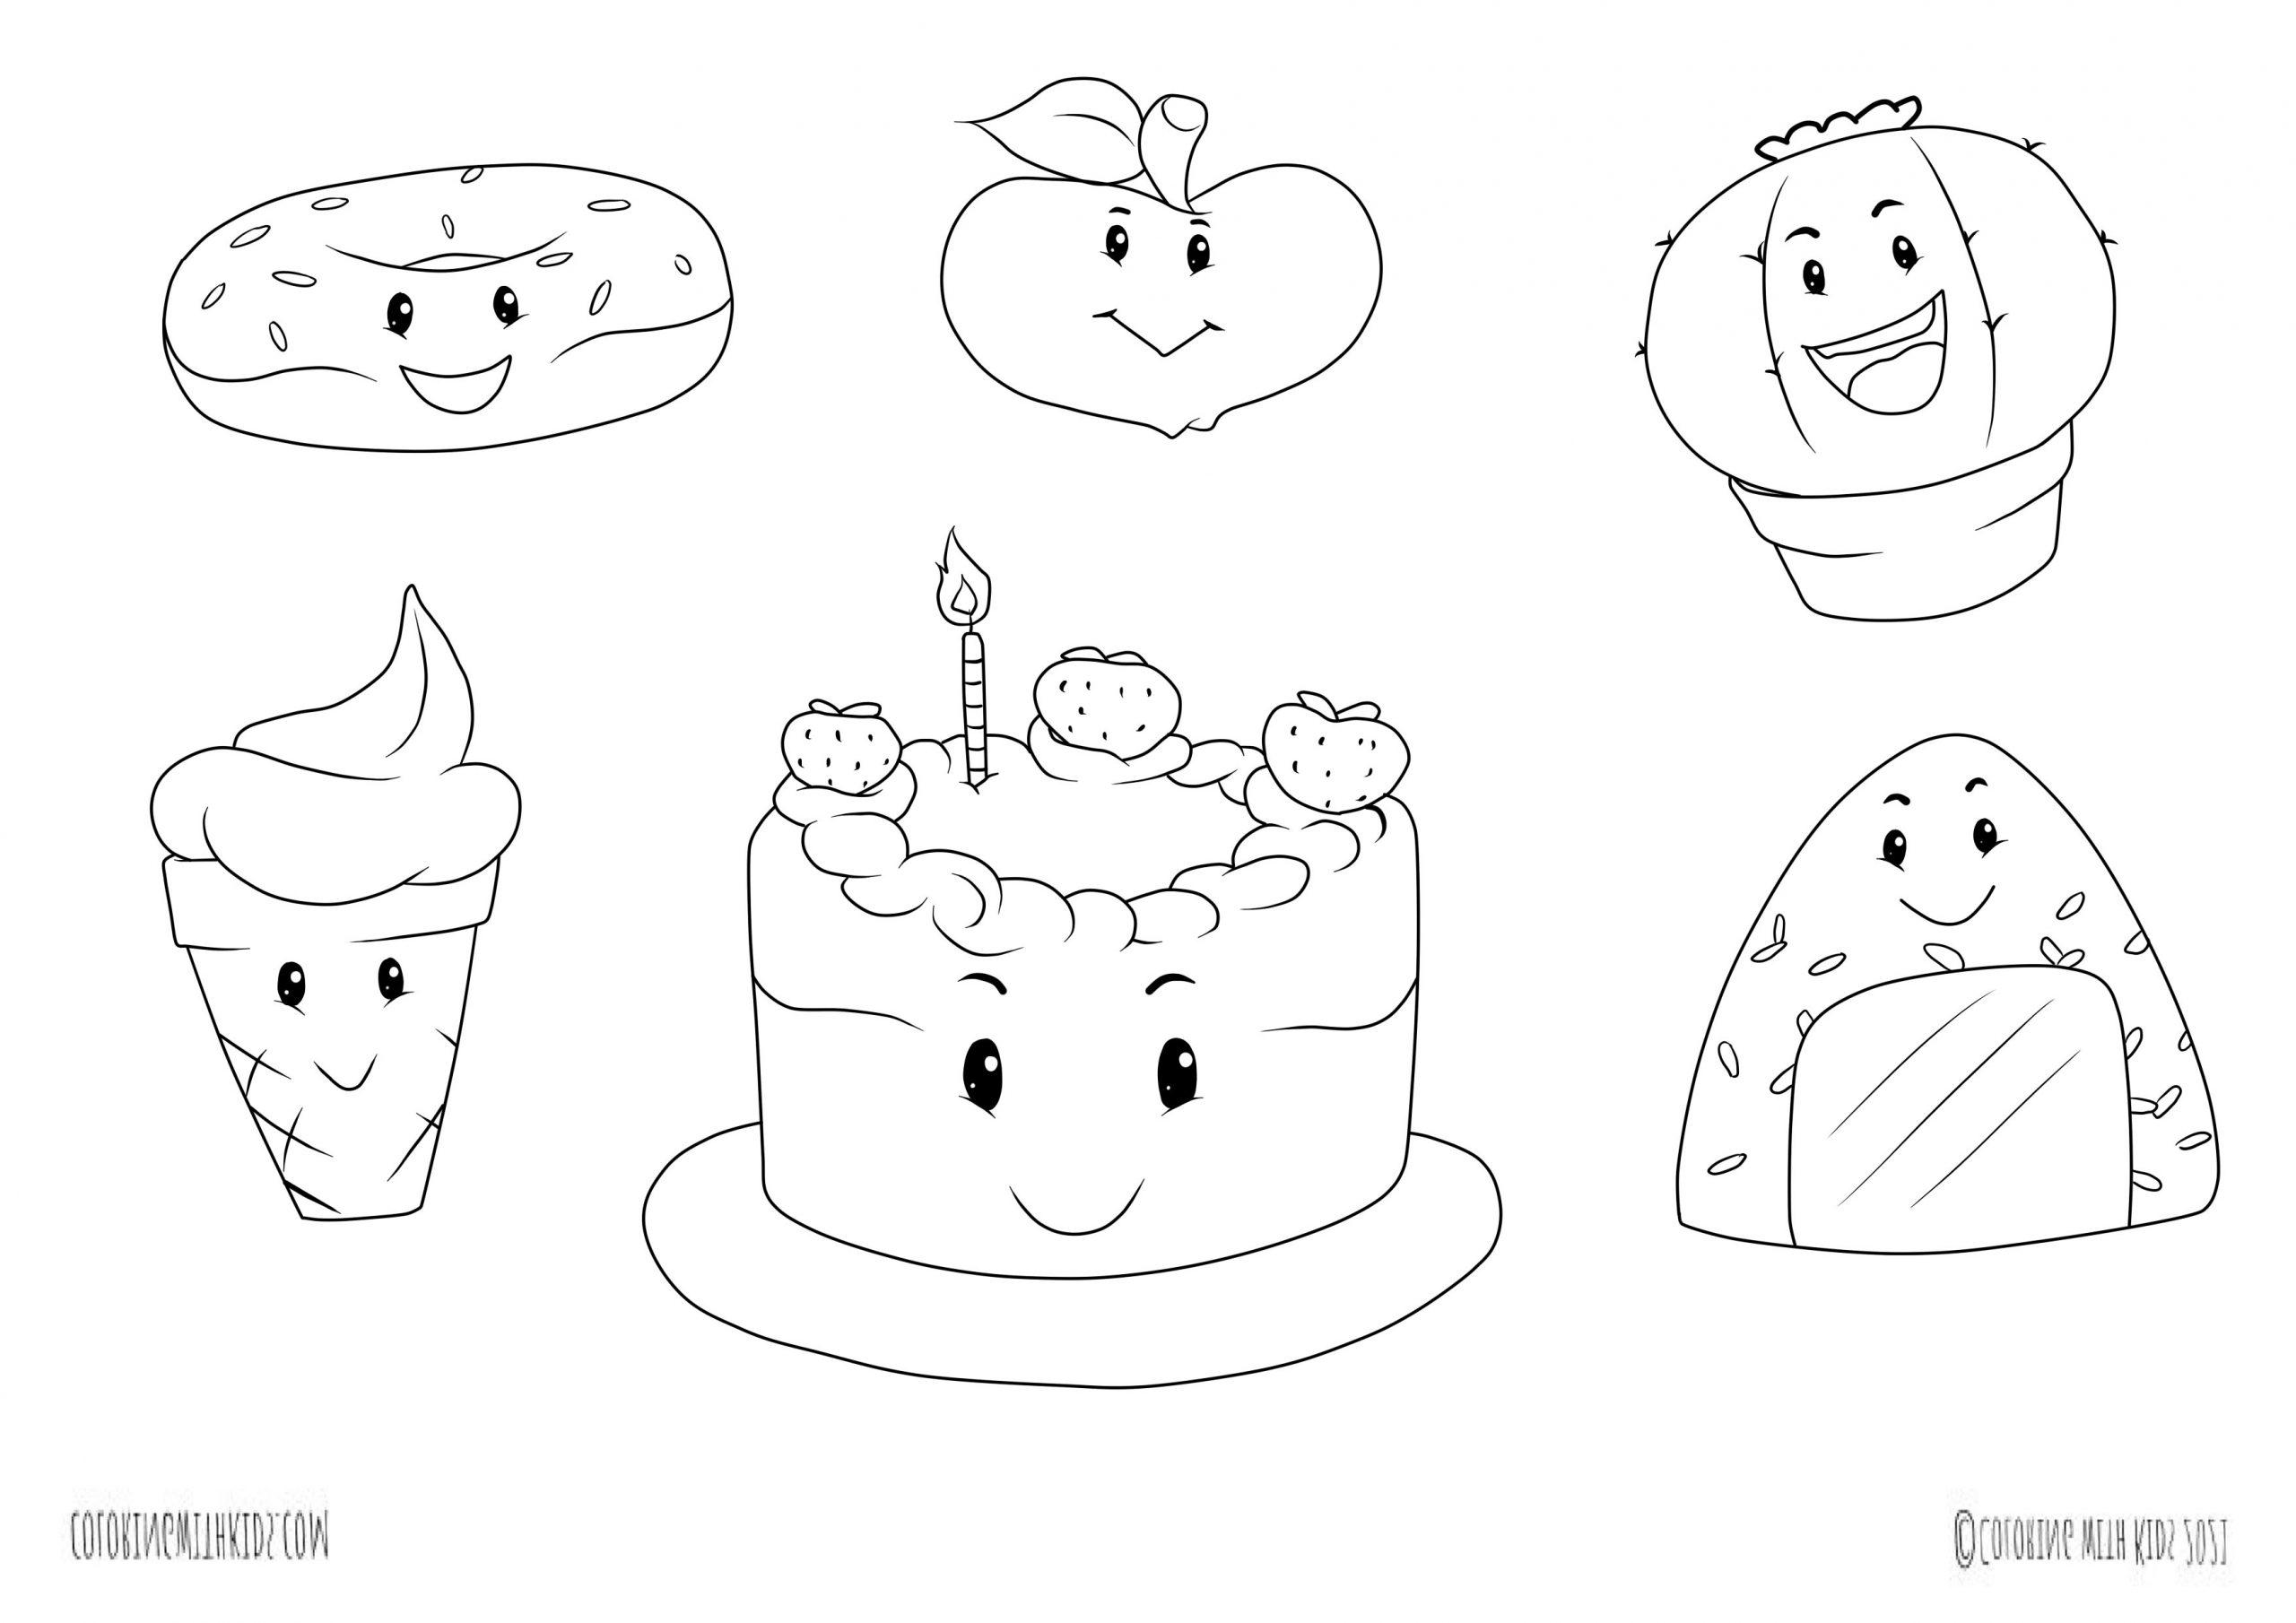 Kawaii Food Doodles coloring page